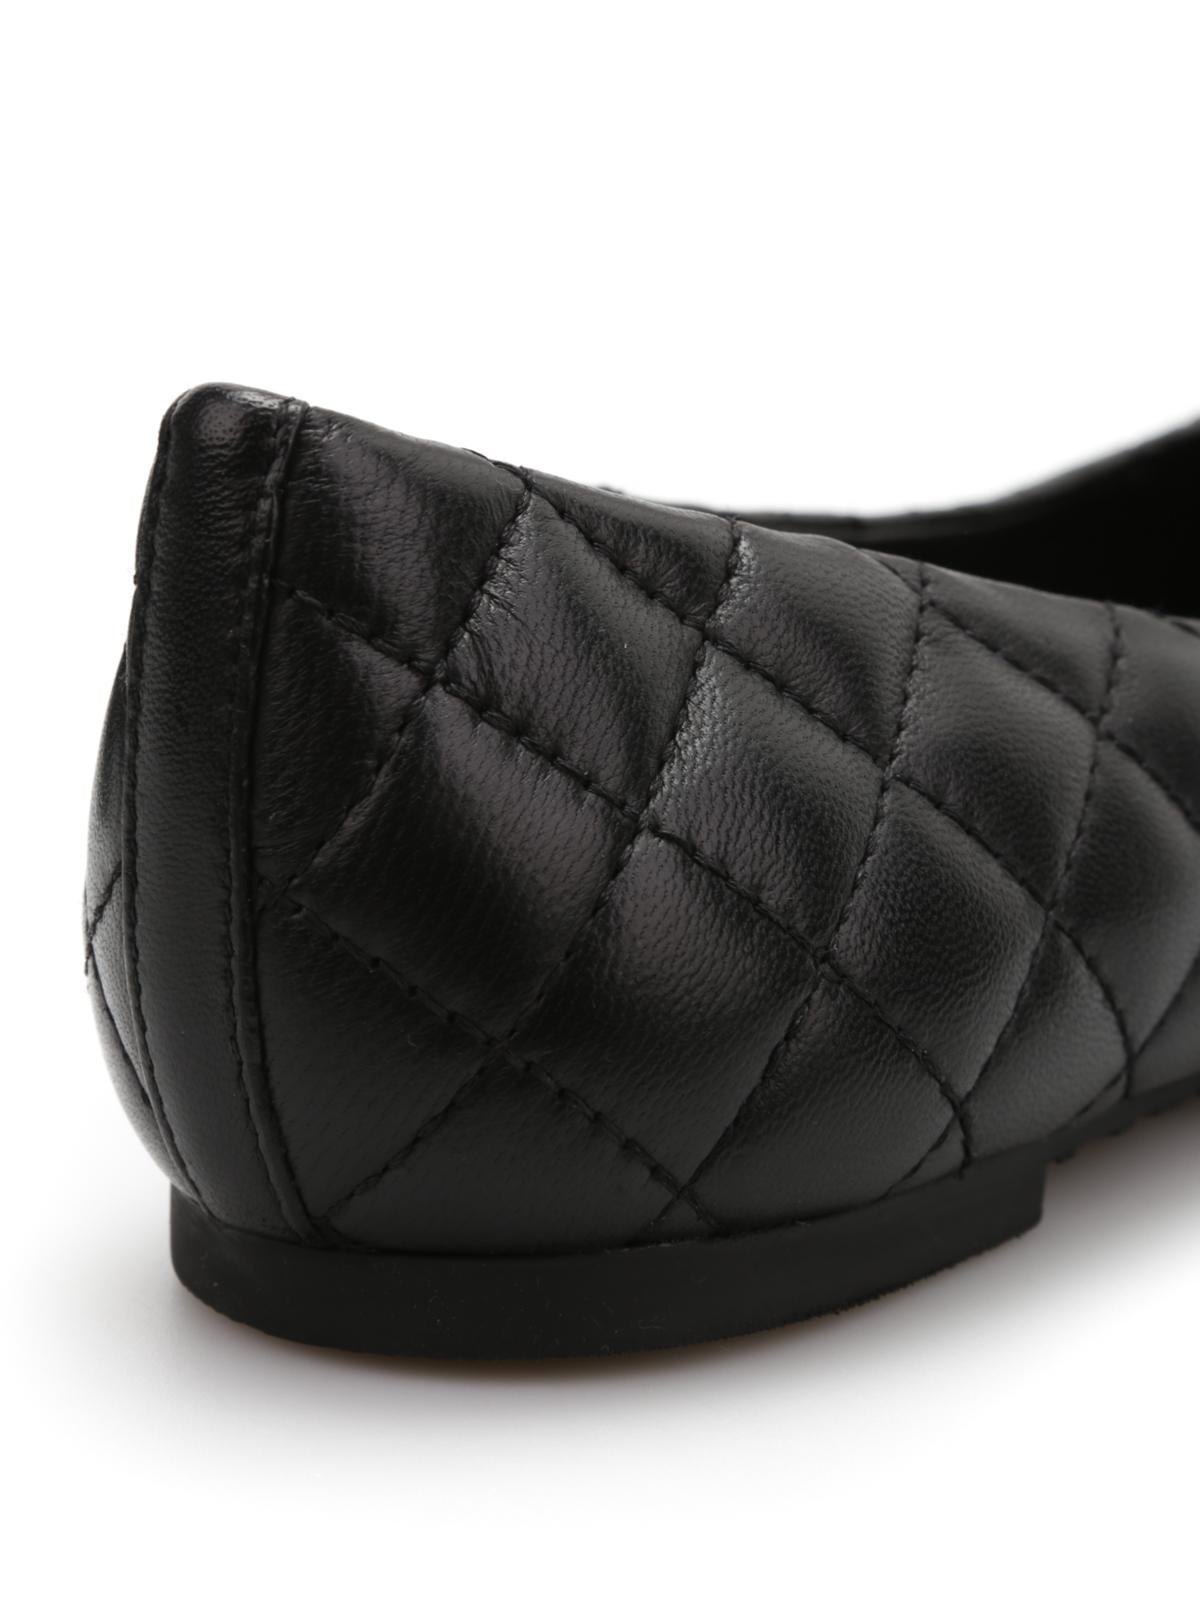 d5e8a1e44 TORY BURCH buy online Leather Quinn flats. TORY BURCH  flat shoes ...